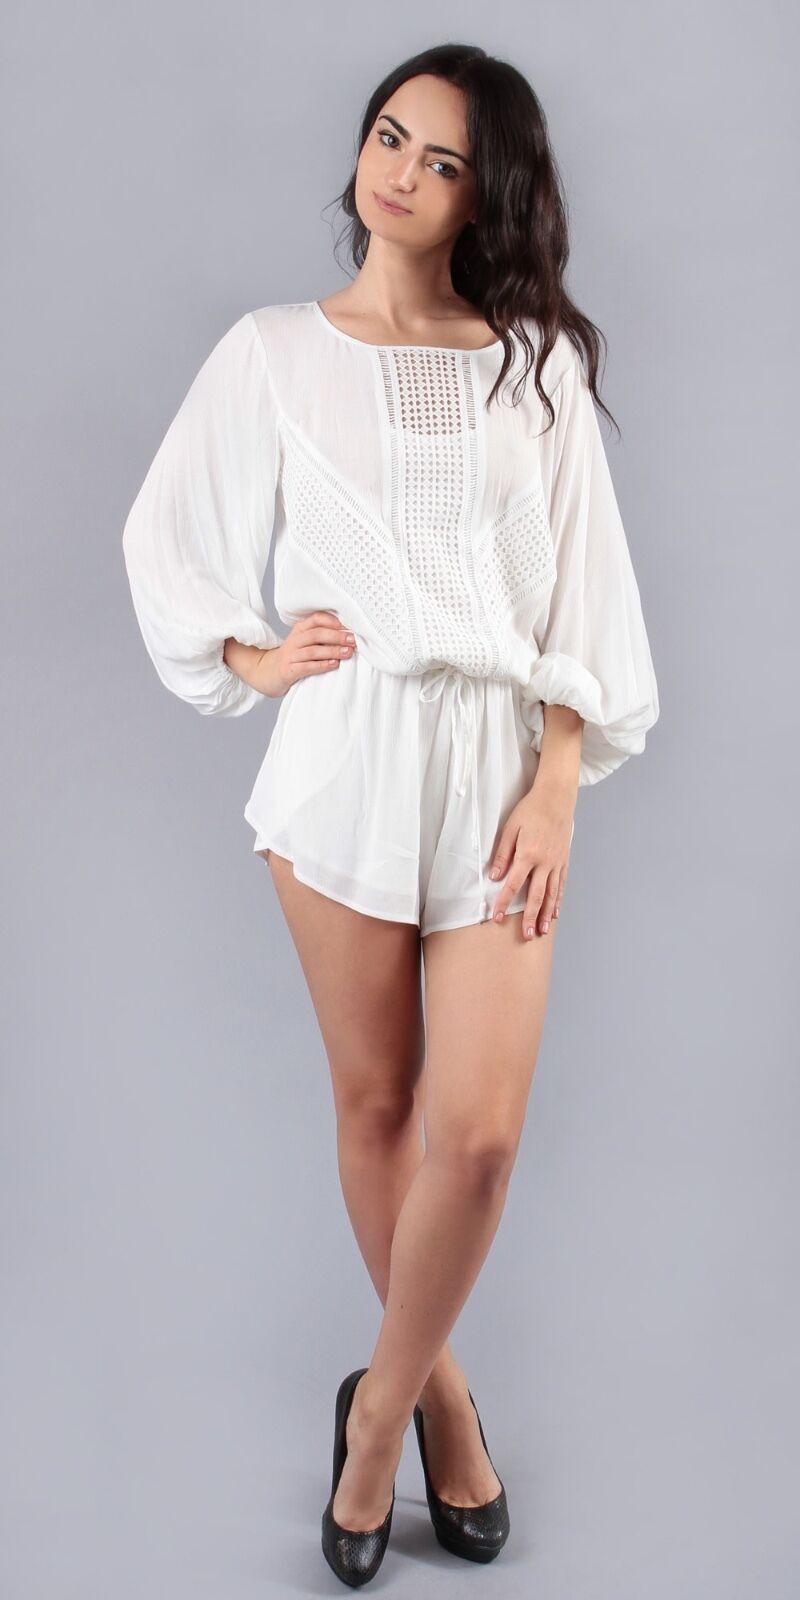 Liberty Garden Lace Crochet Romper Shorts   Blouson Long Sleeve XS S 5HMY8311